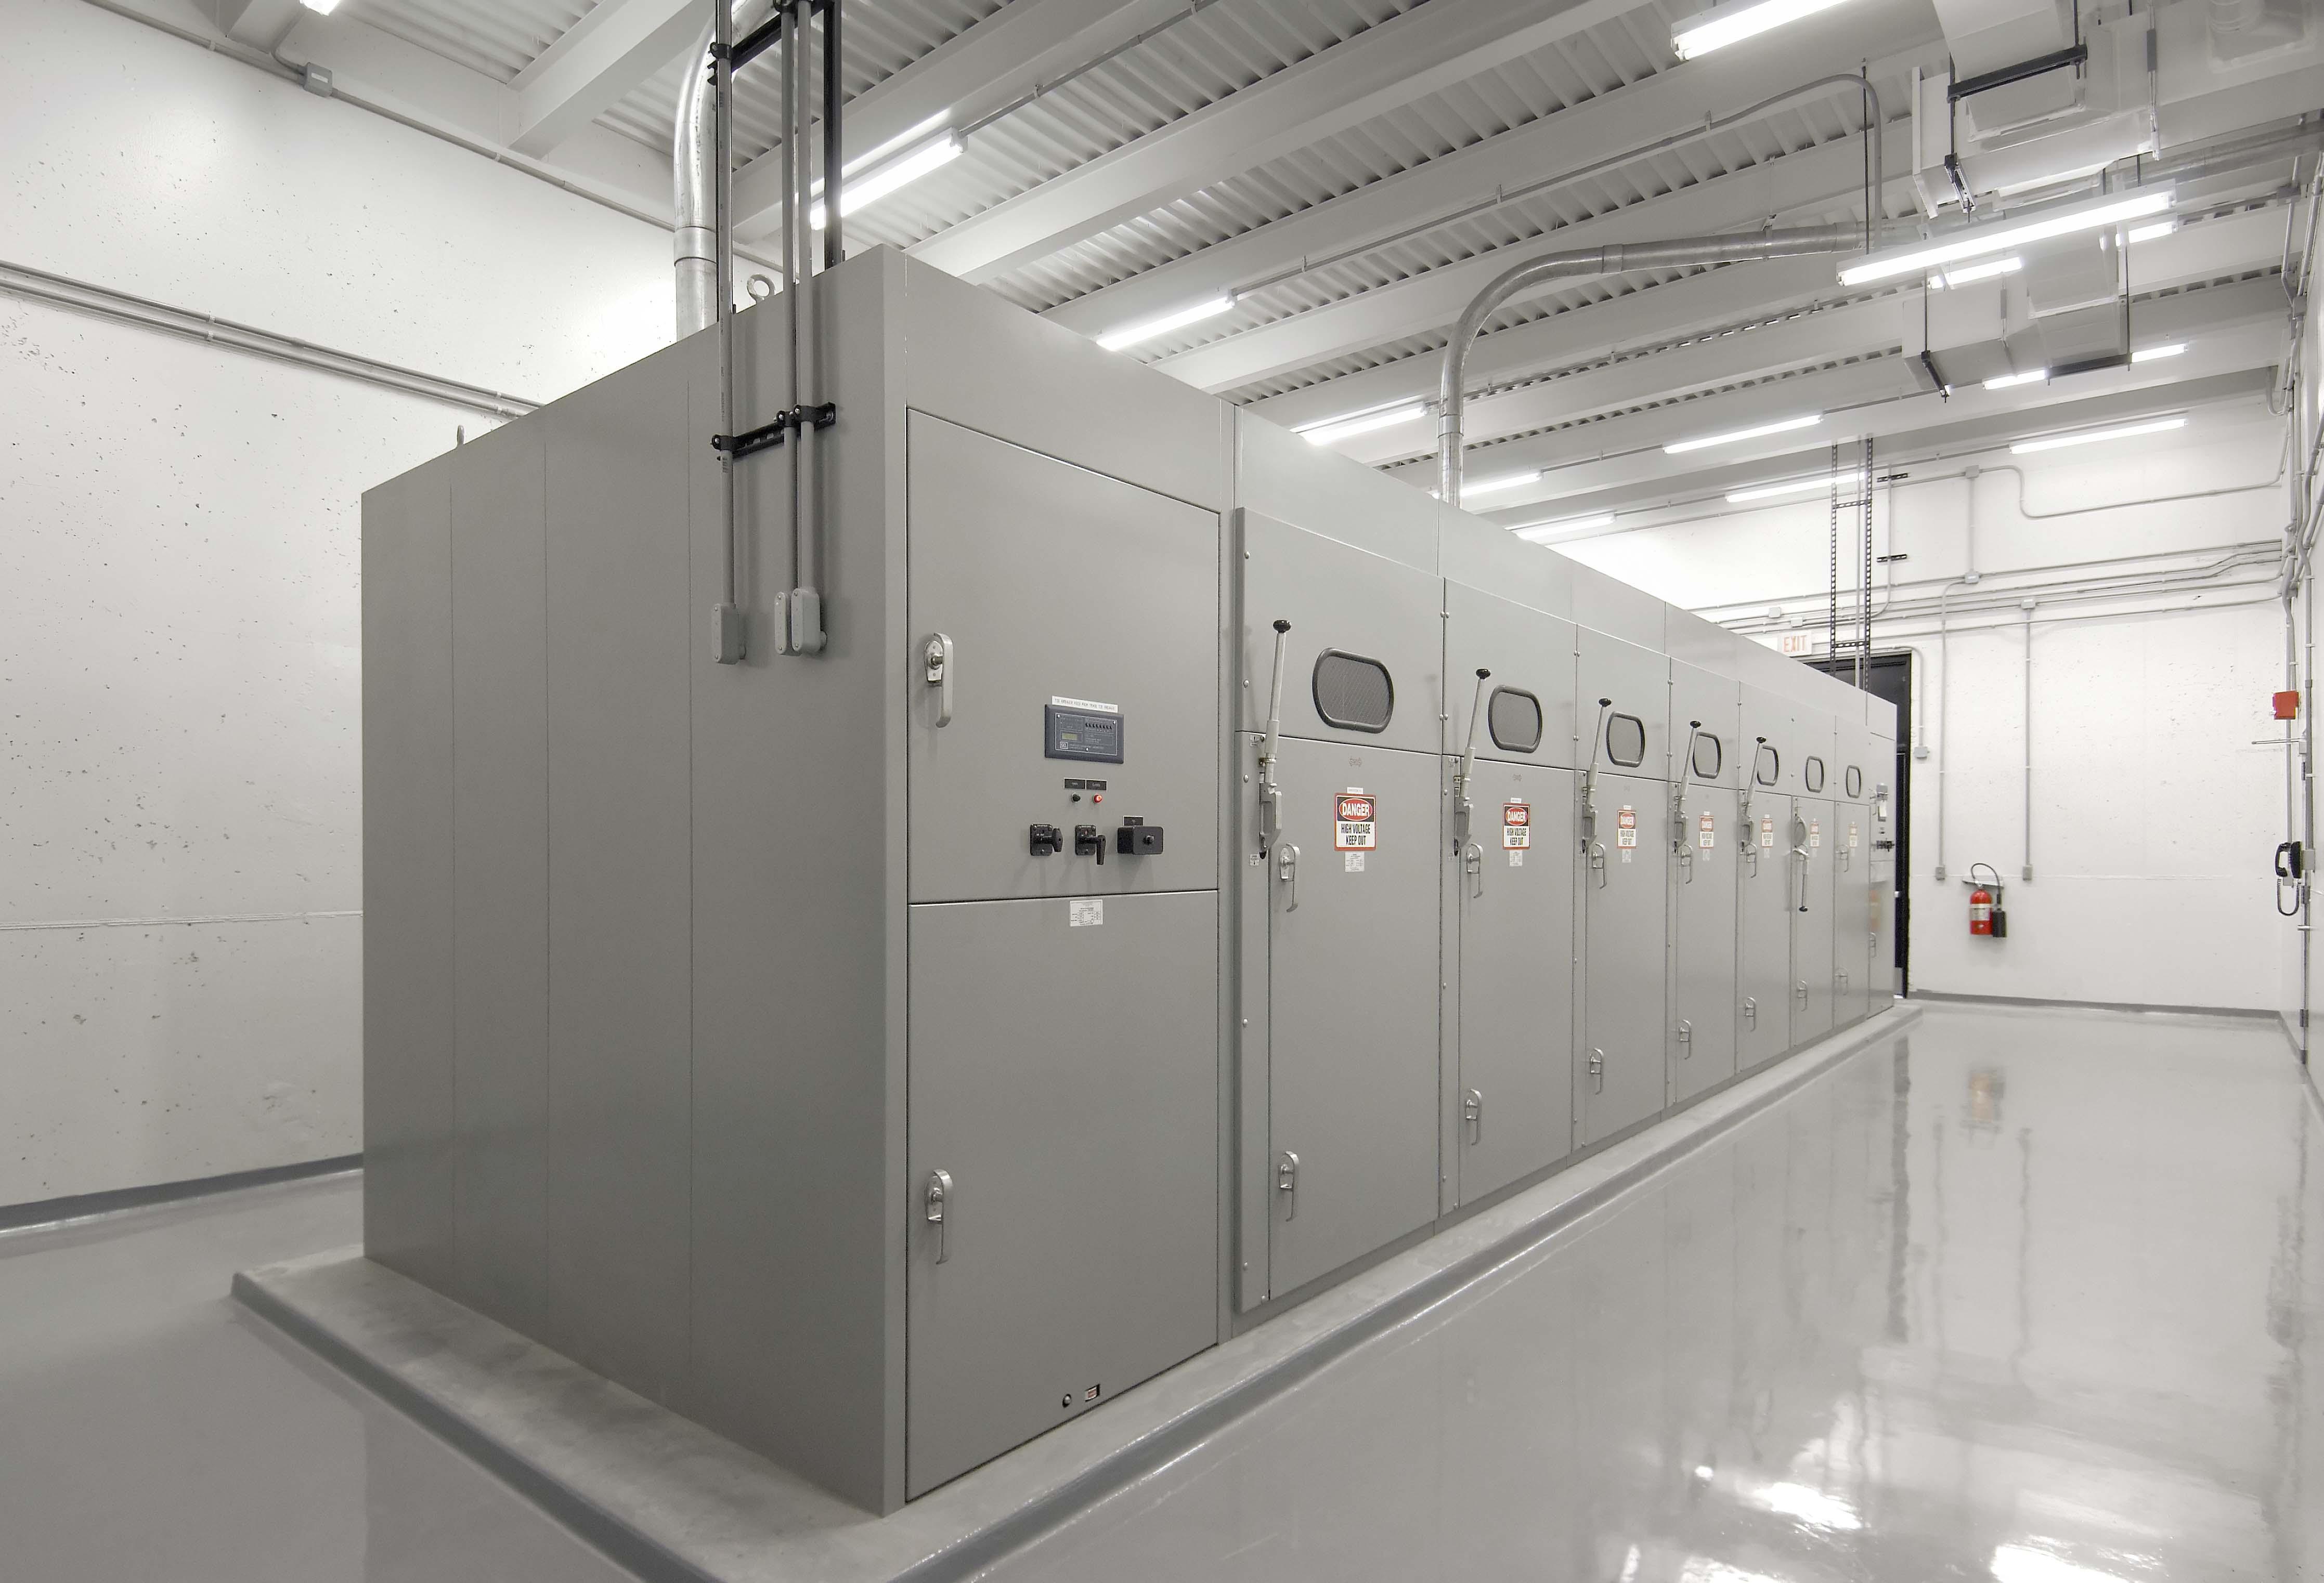 Clean Manufacturing Facilities Architecture & Design - KFI